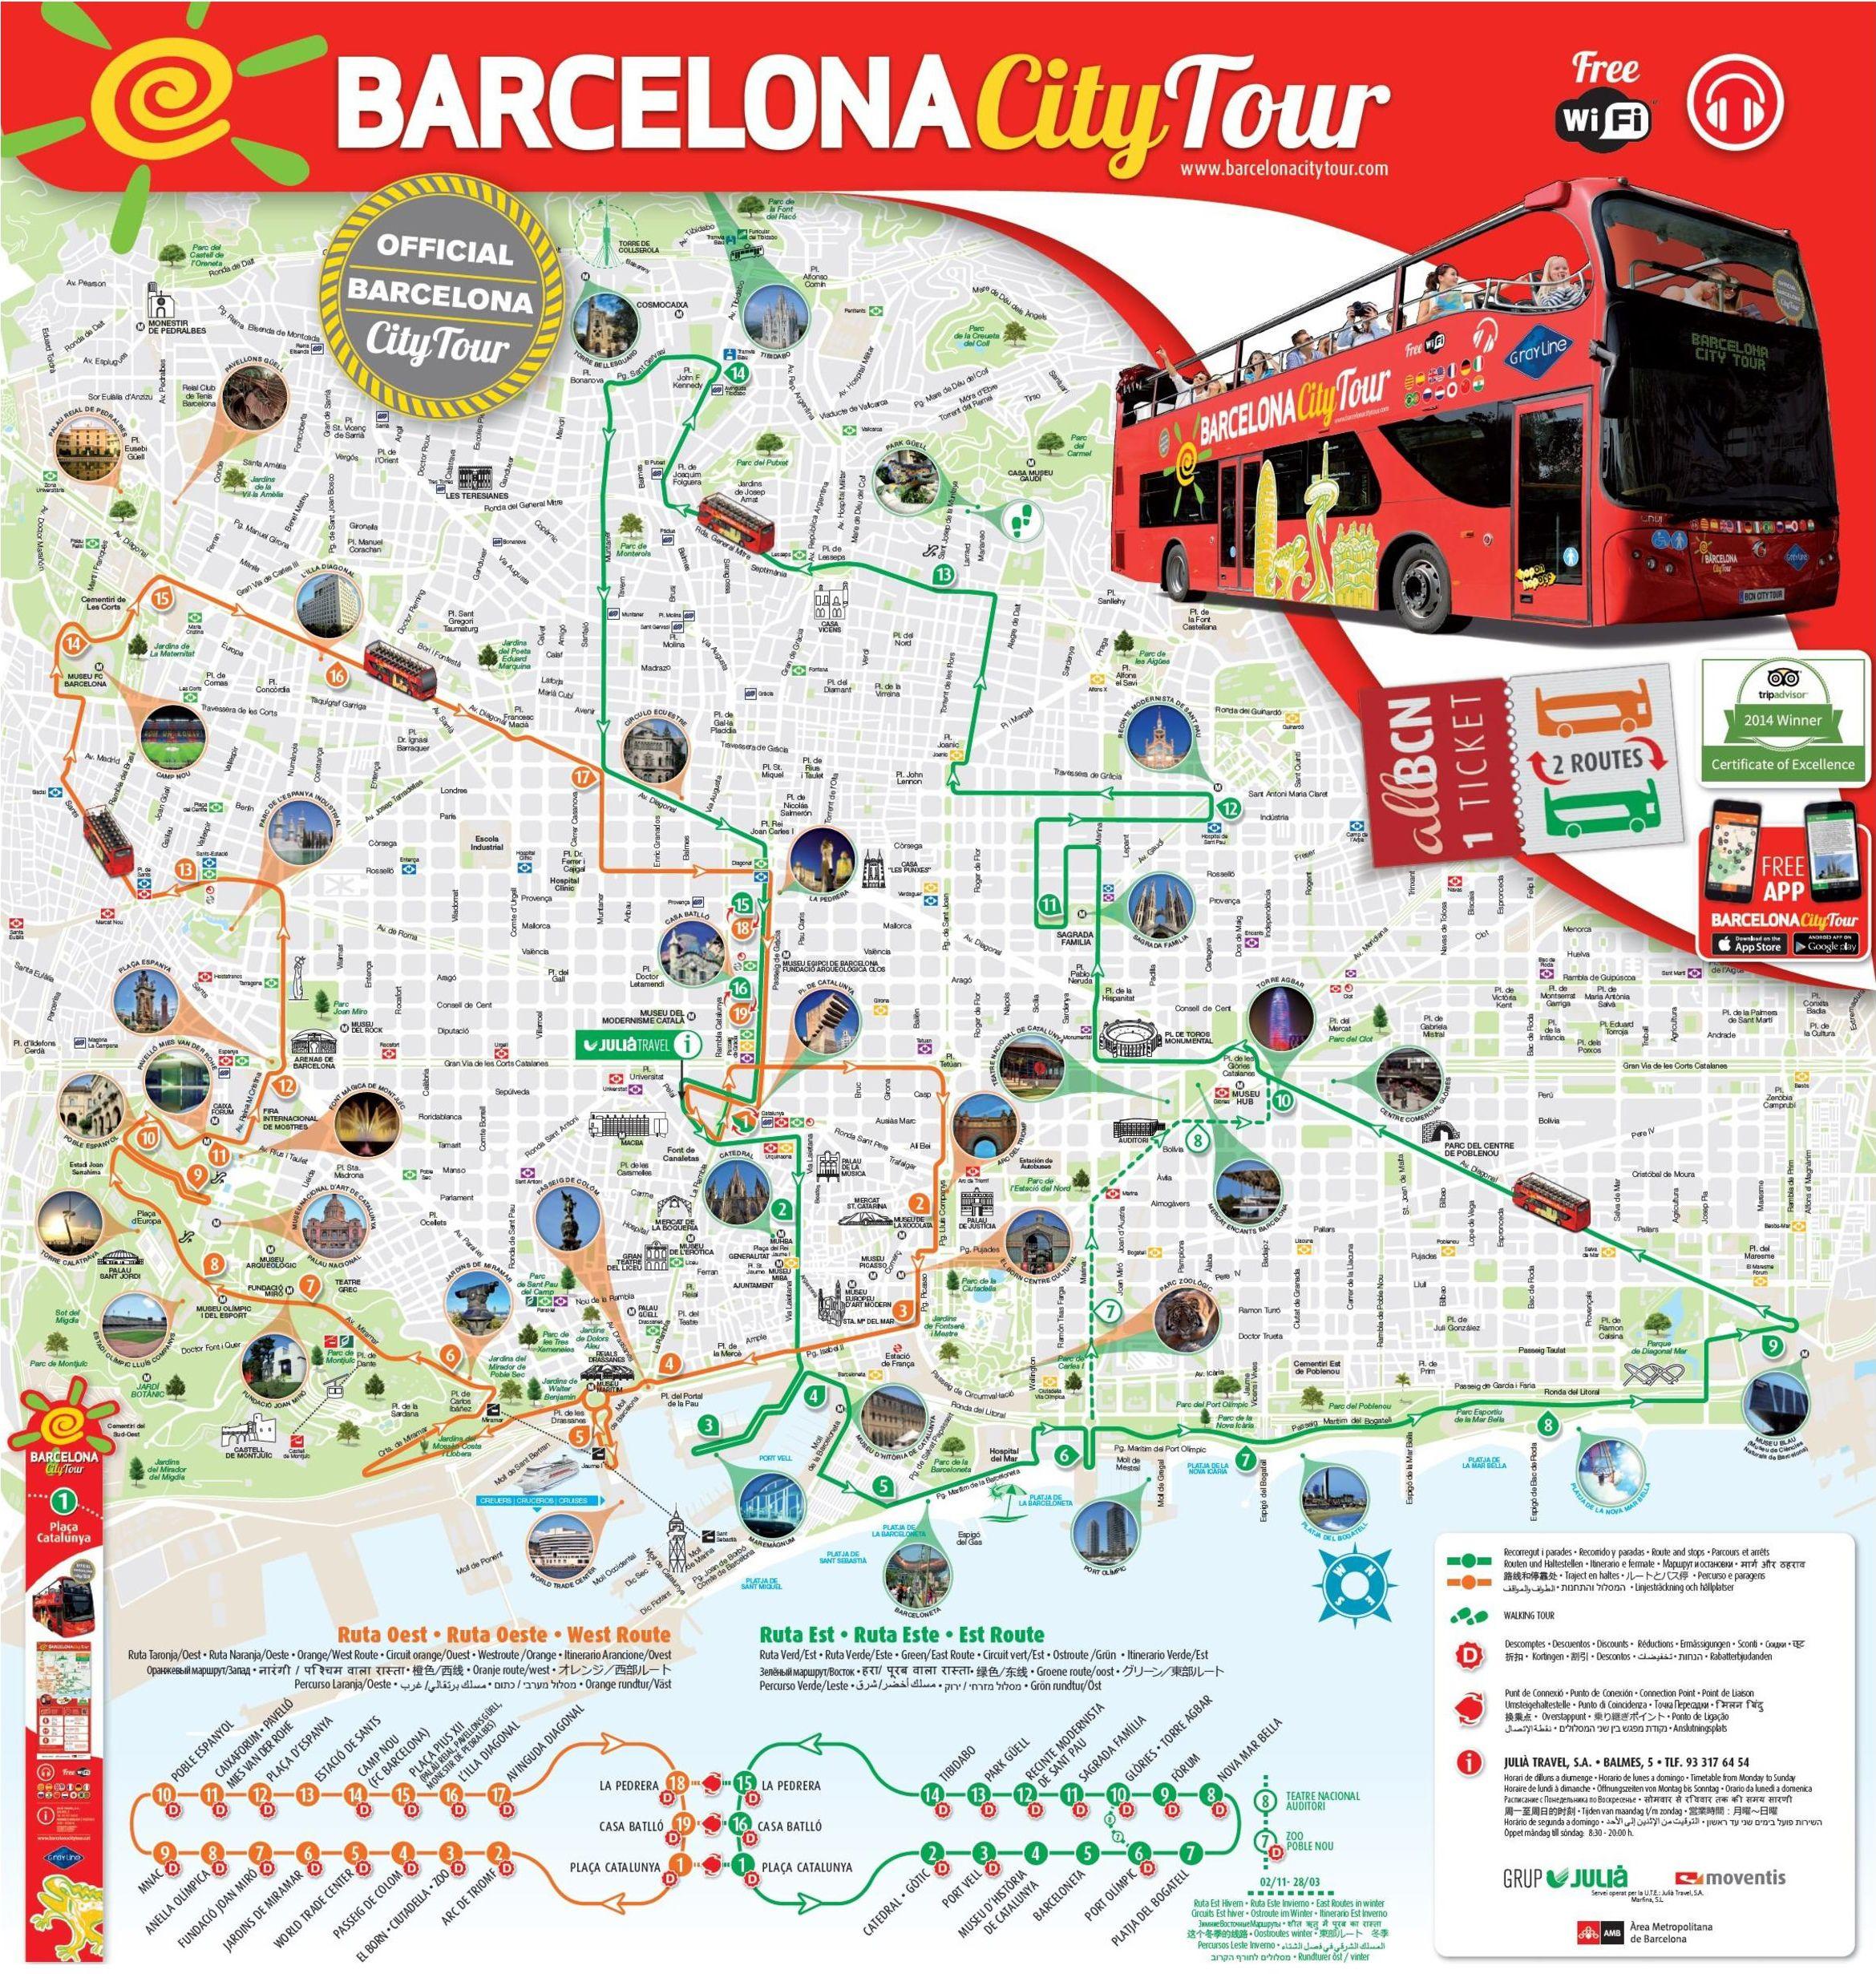 la metro bus map with Carte De Barcelone on  besides e Muoversi A Los Angeles also My Top 4 City Swimming Pools In Madrid also Plan Mus C3 A9e Du Louvre Paris also Carte De Barcelone.